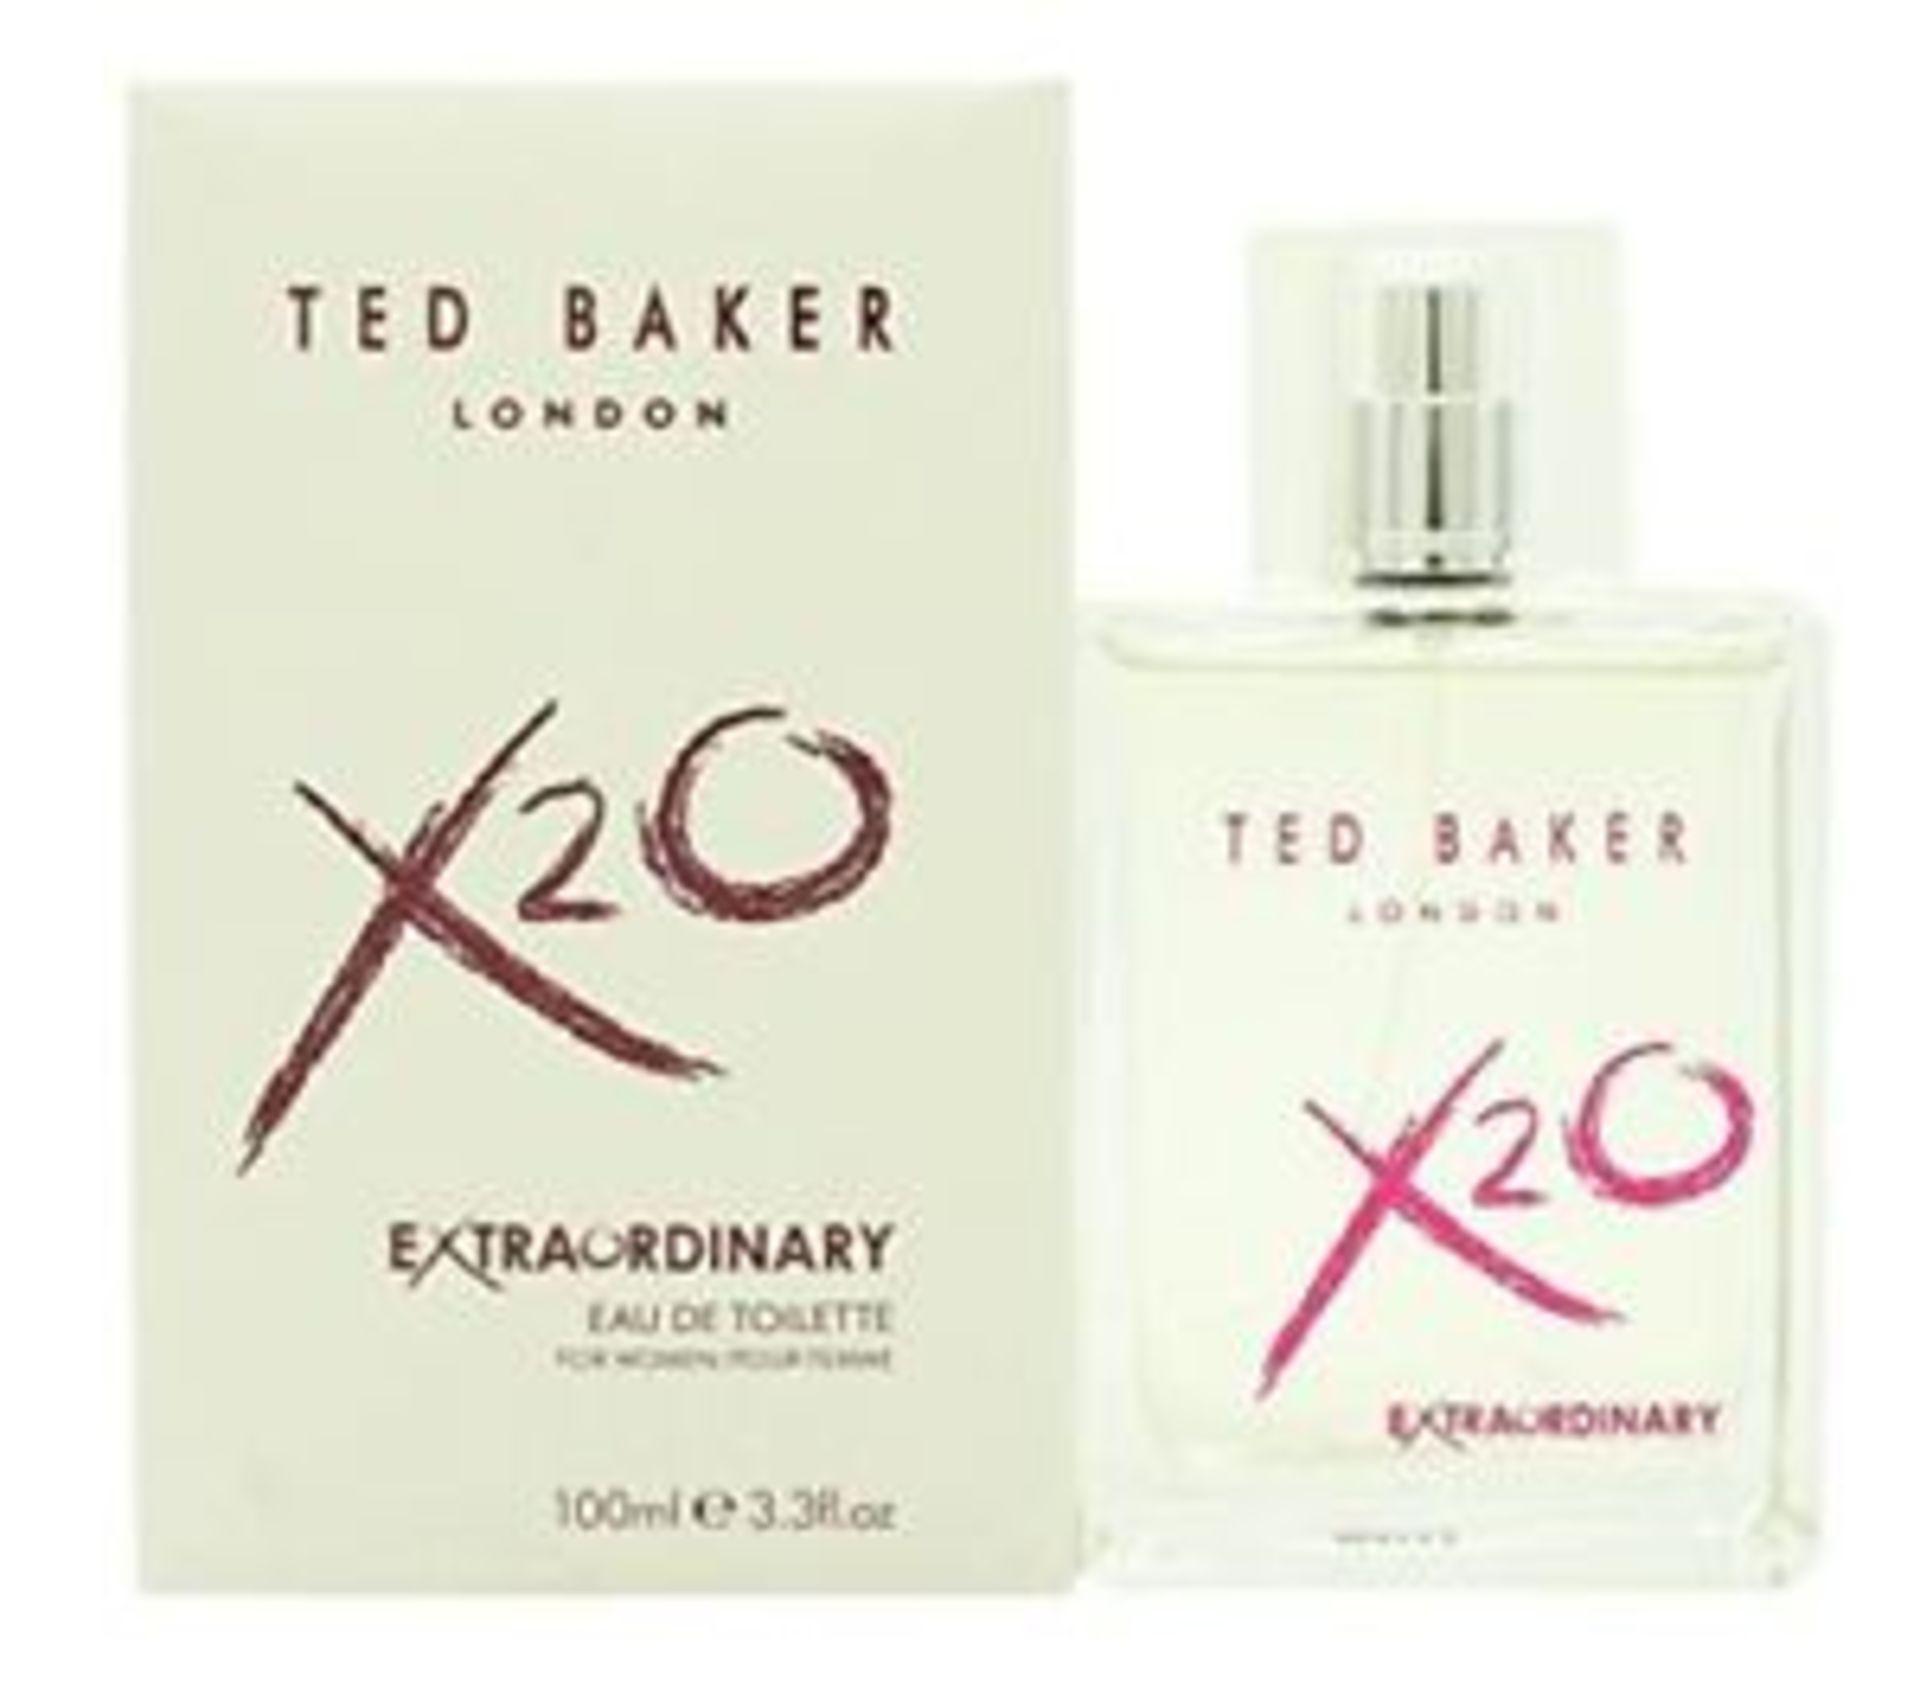 Lot 51592 - V Brand New 100ml Ted Baker London X20 Extraordinary Eau De Toilette Pour Femme ISP £26.24 (Ebay)